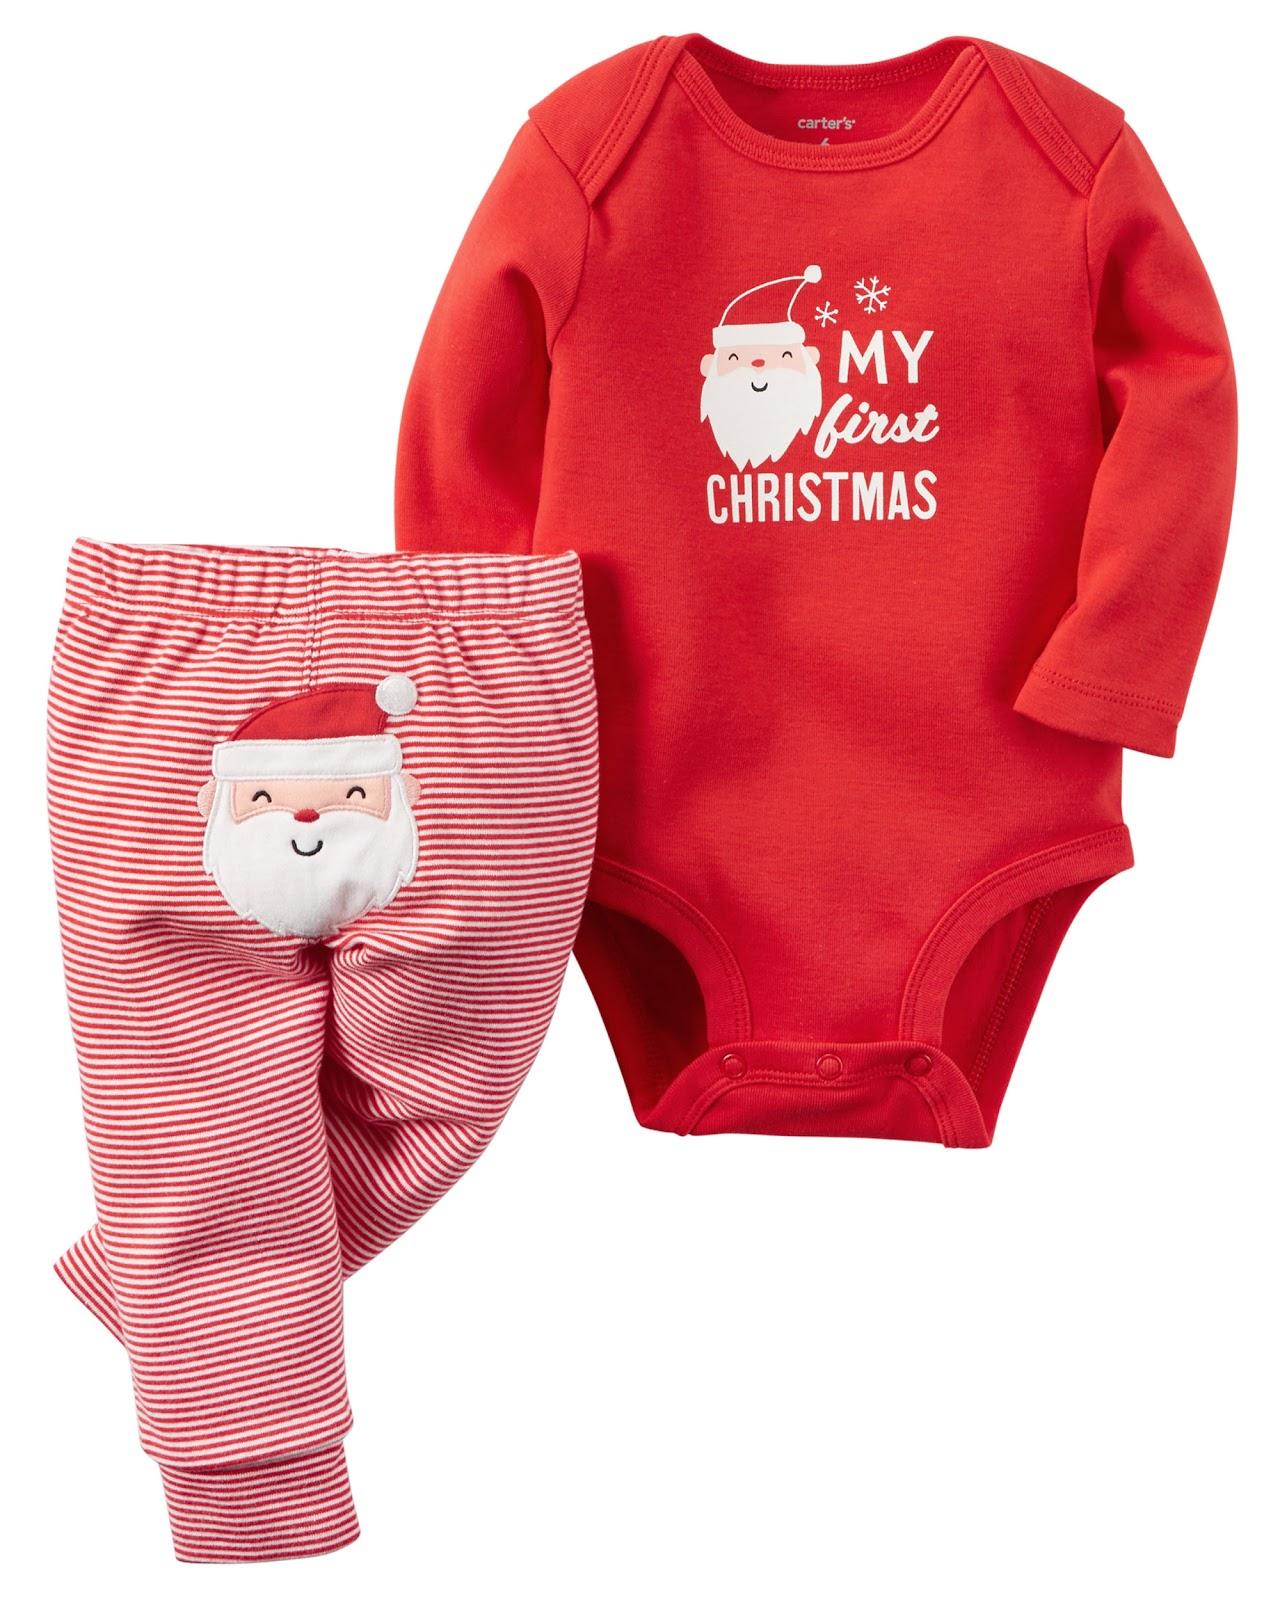 Kết quả hình ảnh cho komplet świąteczny dla niemowlaka